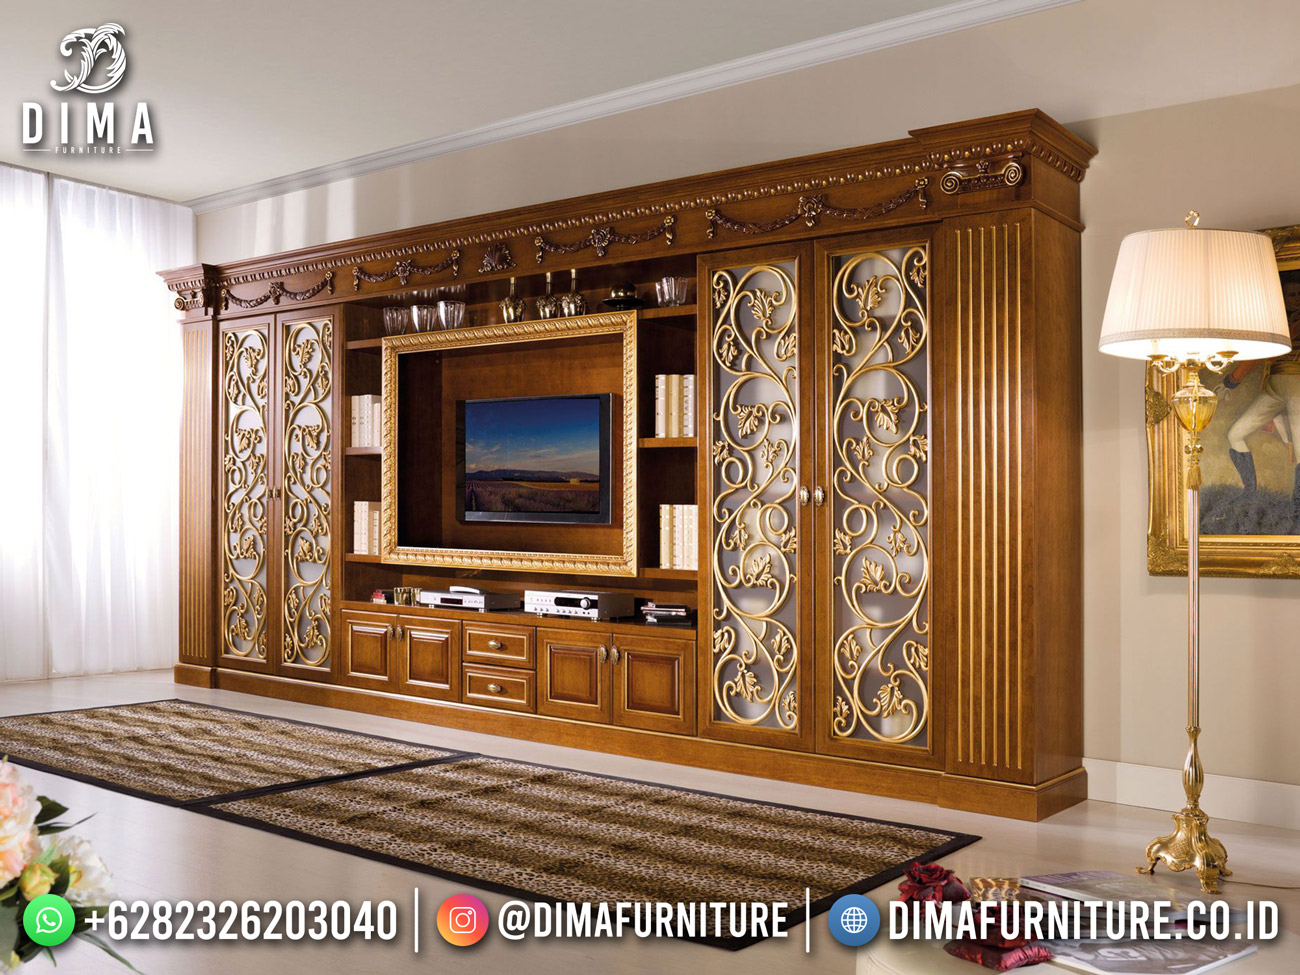 Desain Mewah Bufet TV Terbaru Kayu Jati Luxury Carving Detail DF-1767